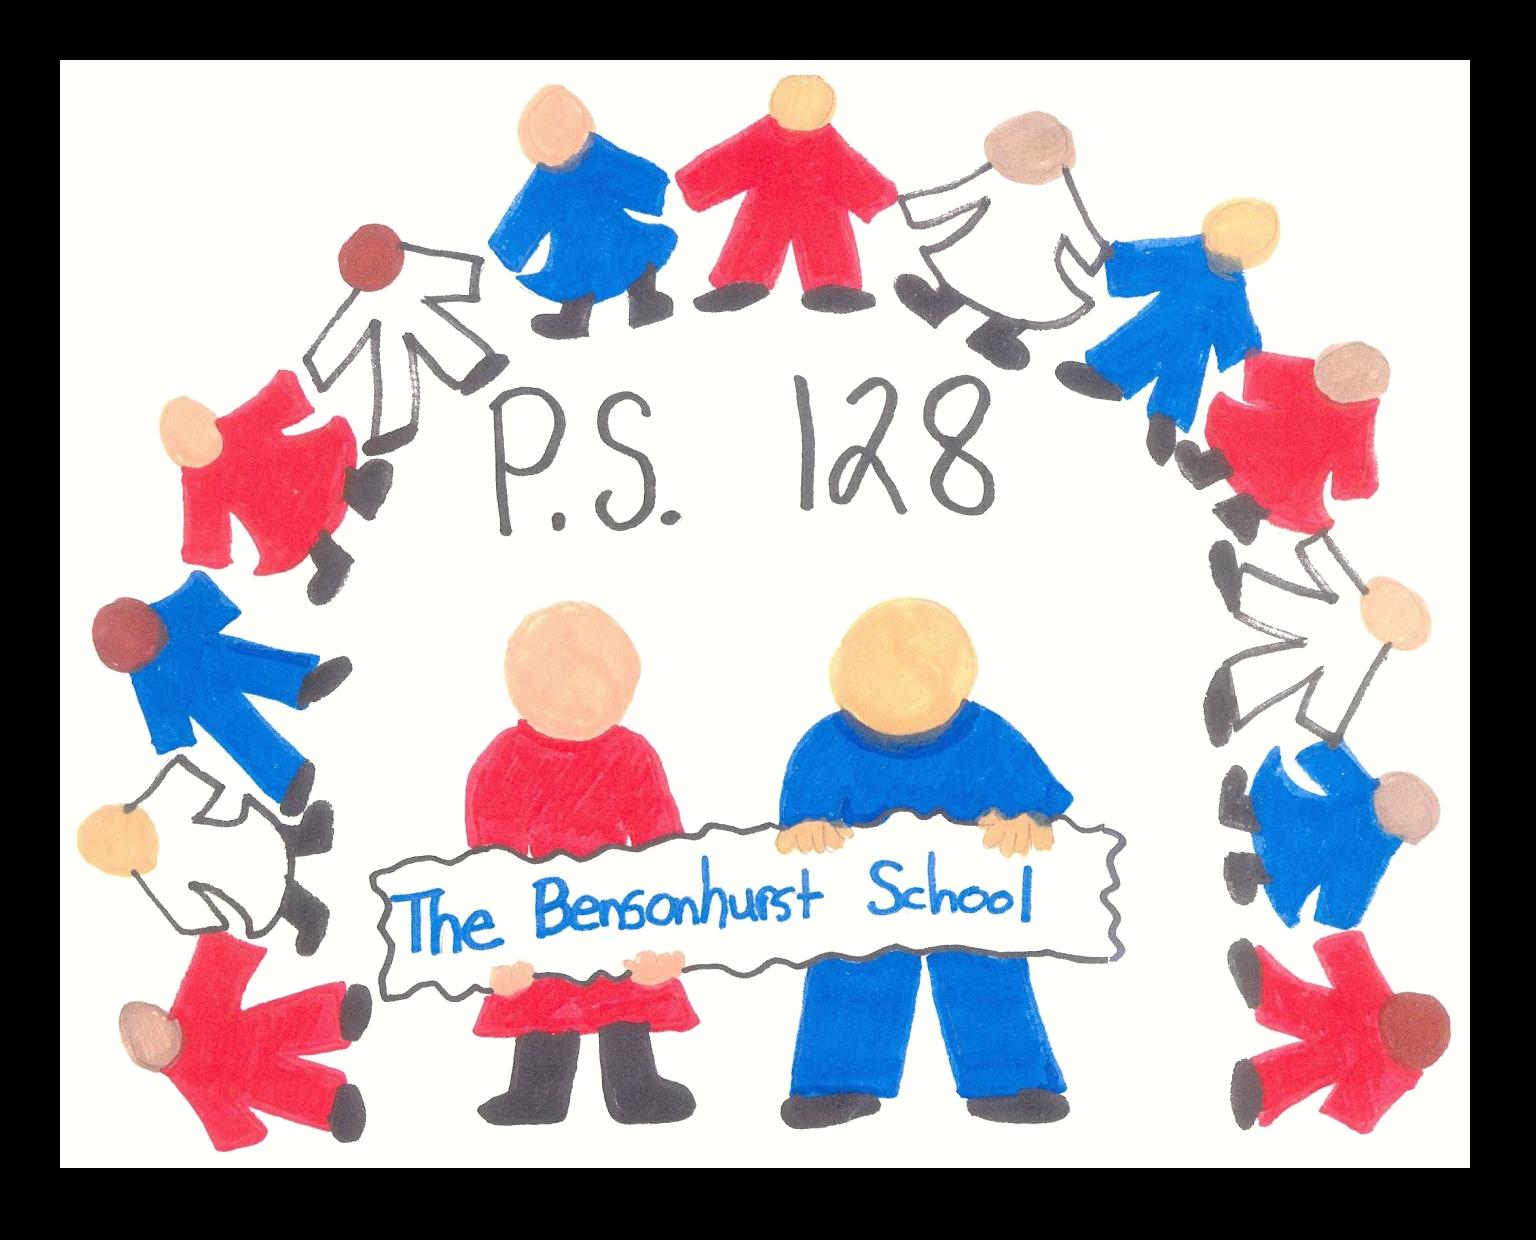 P.S. 128K The Bensonhurst School Home Page